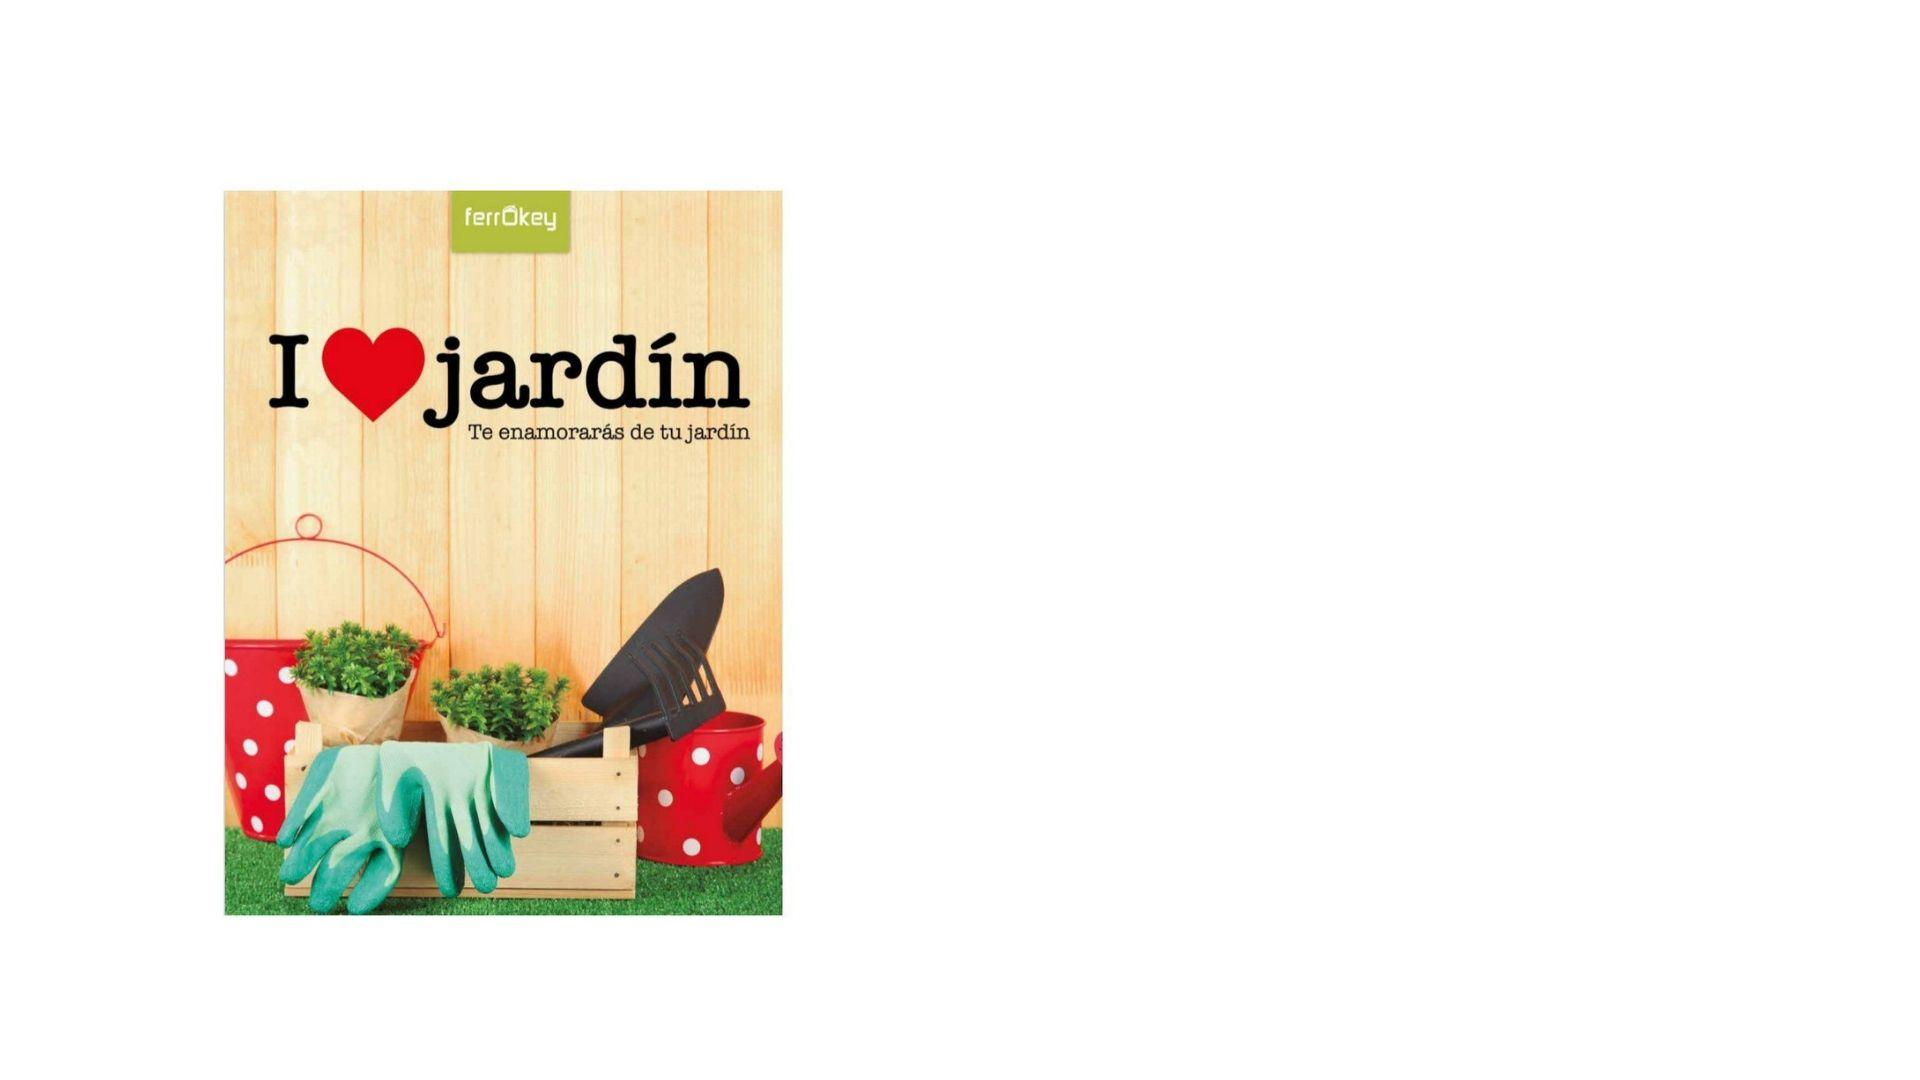 Catálogo Jardín 2019: Catálogos de Ferretería Henares 10